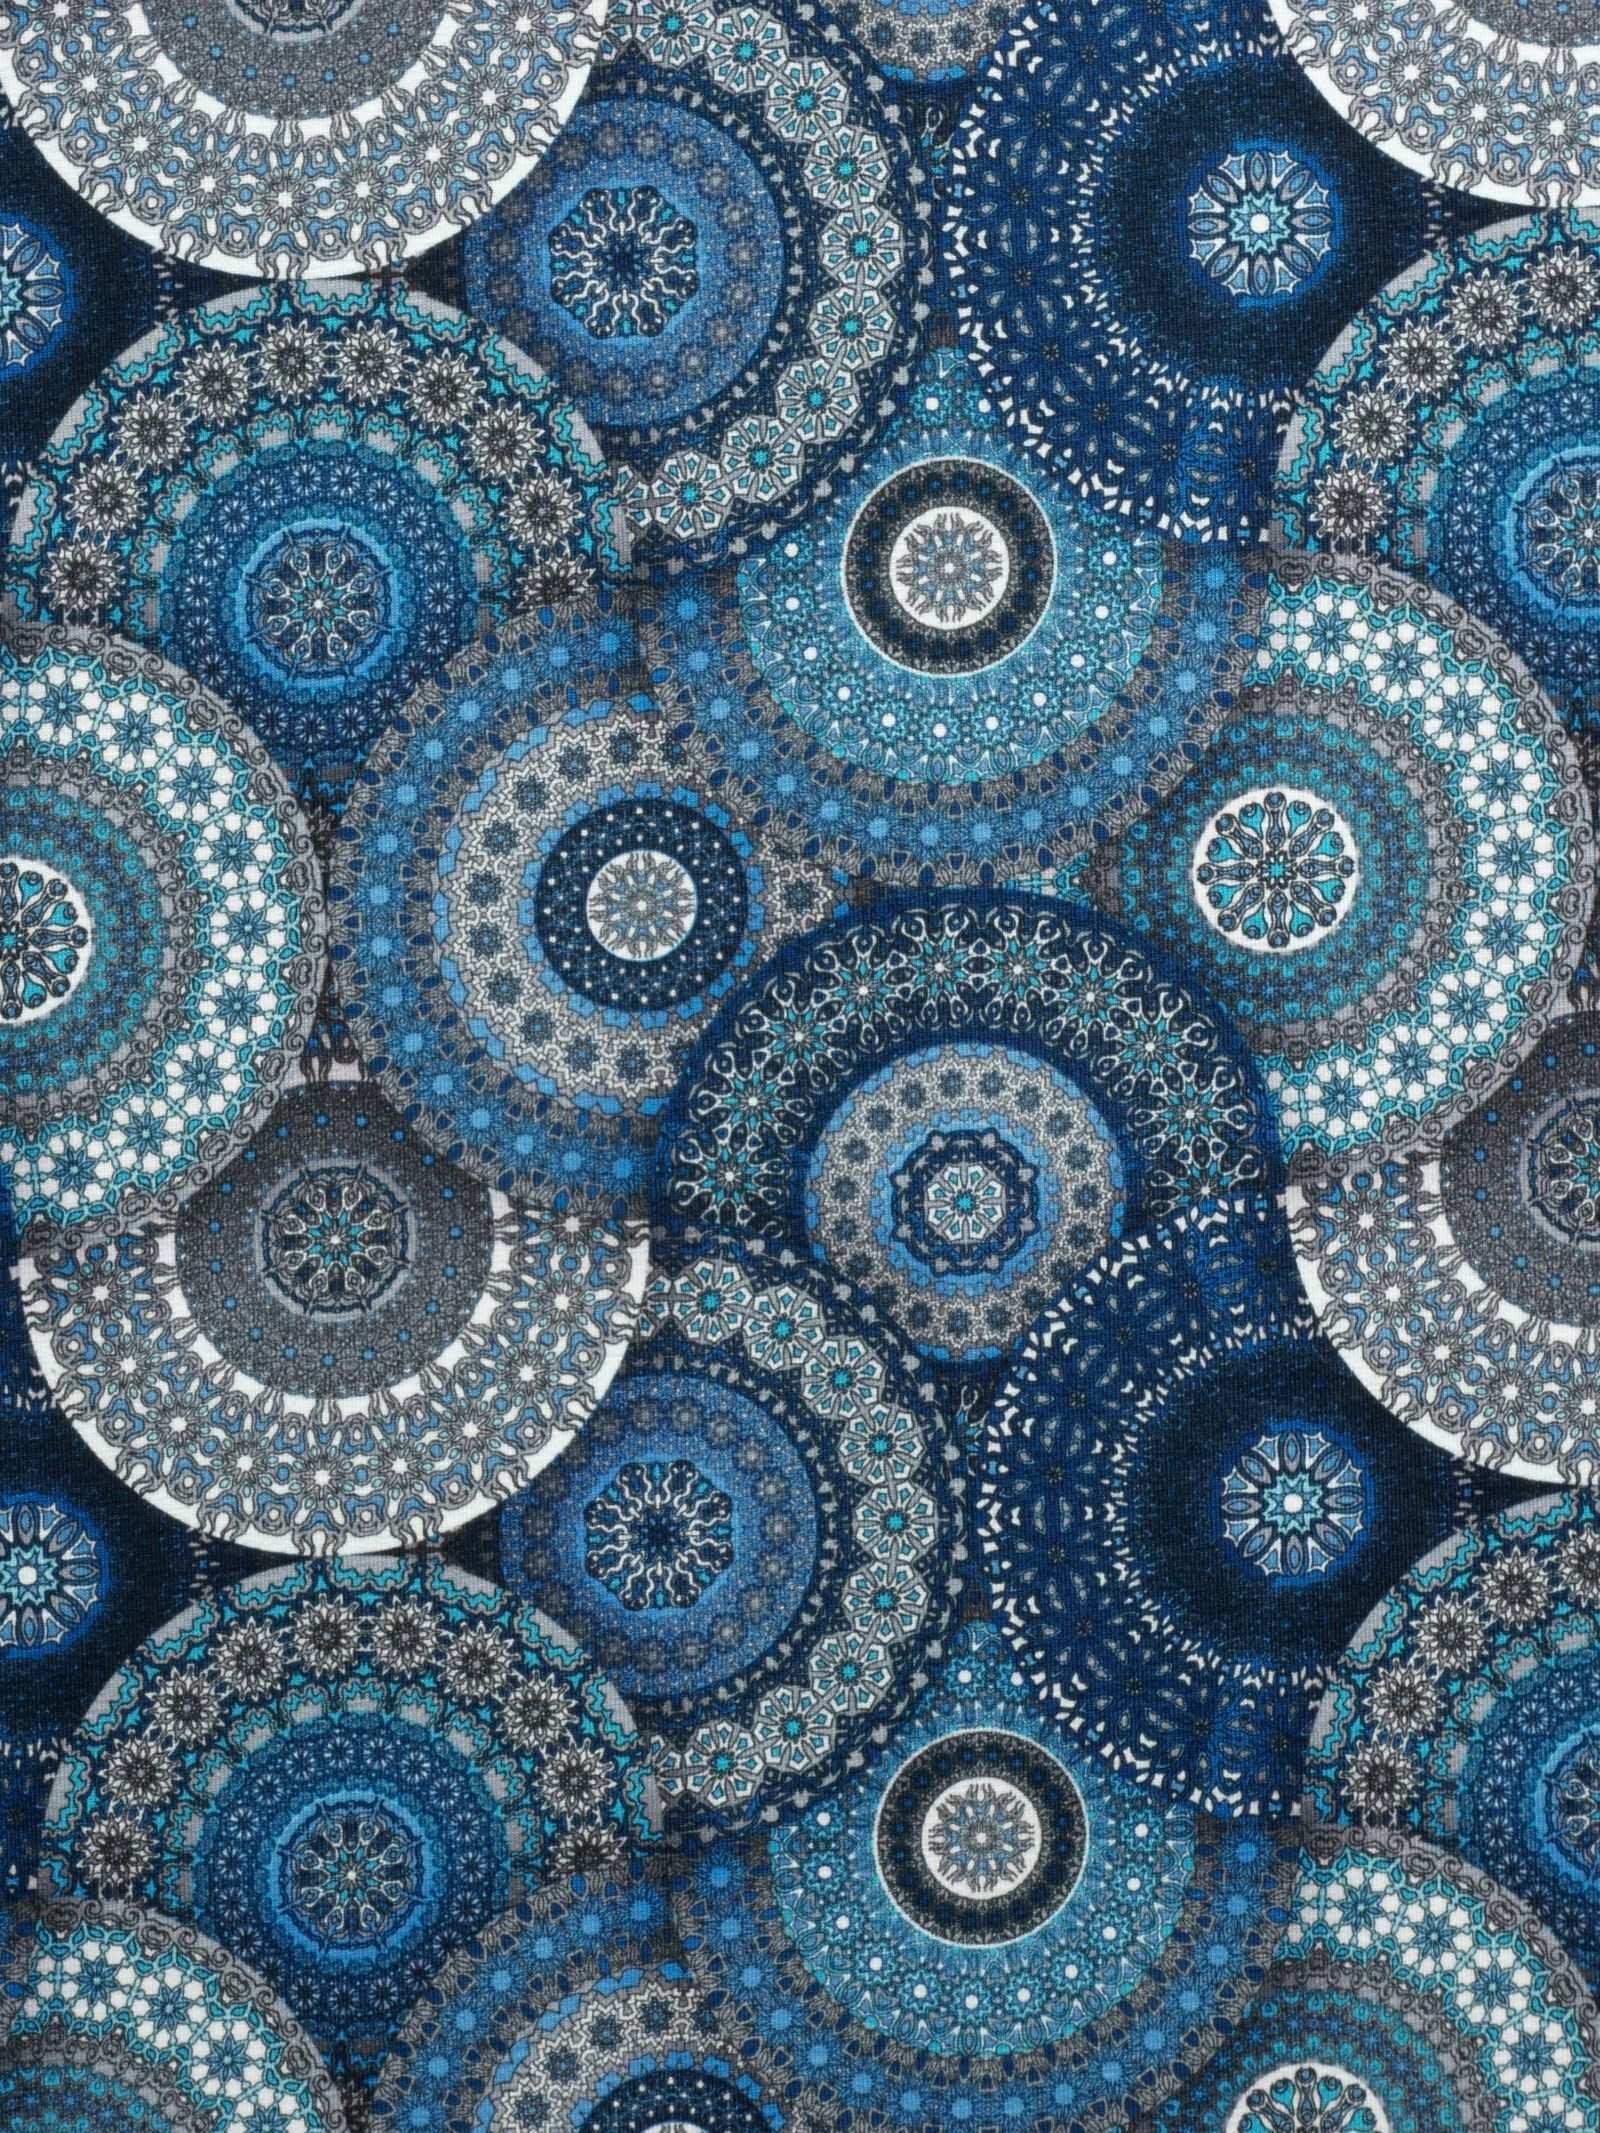 Jersey Stoff Blaue Mandalas Mandala Orientalisch Mystisch Meditation Mandala Quilts Decor